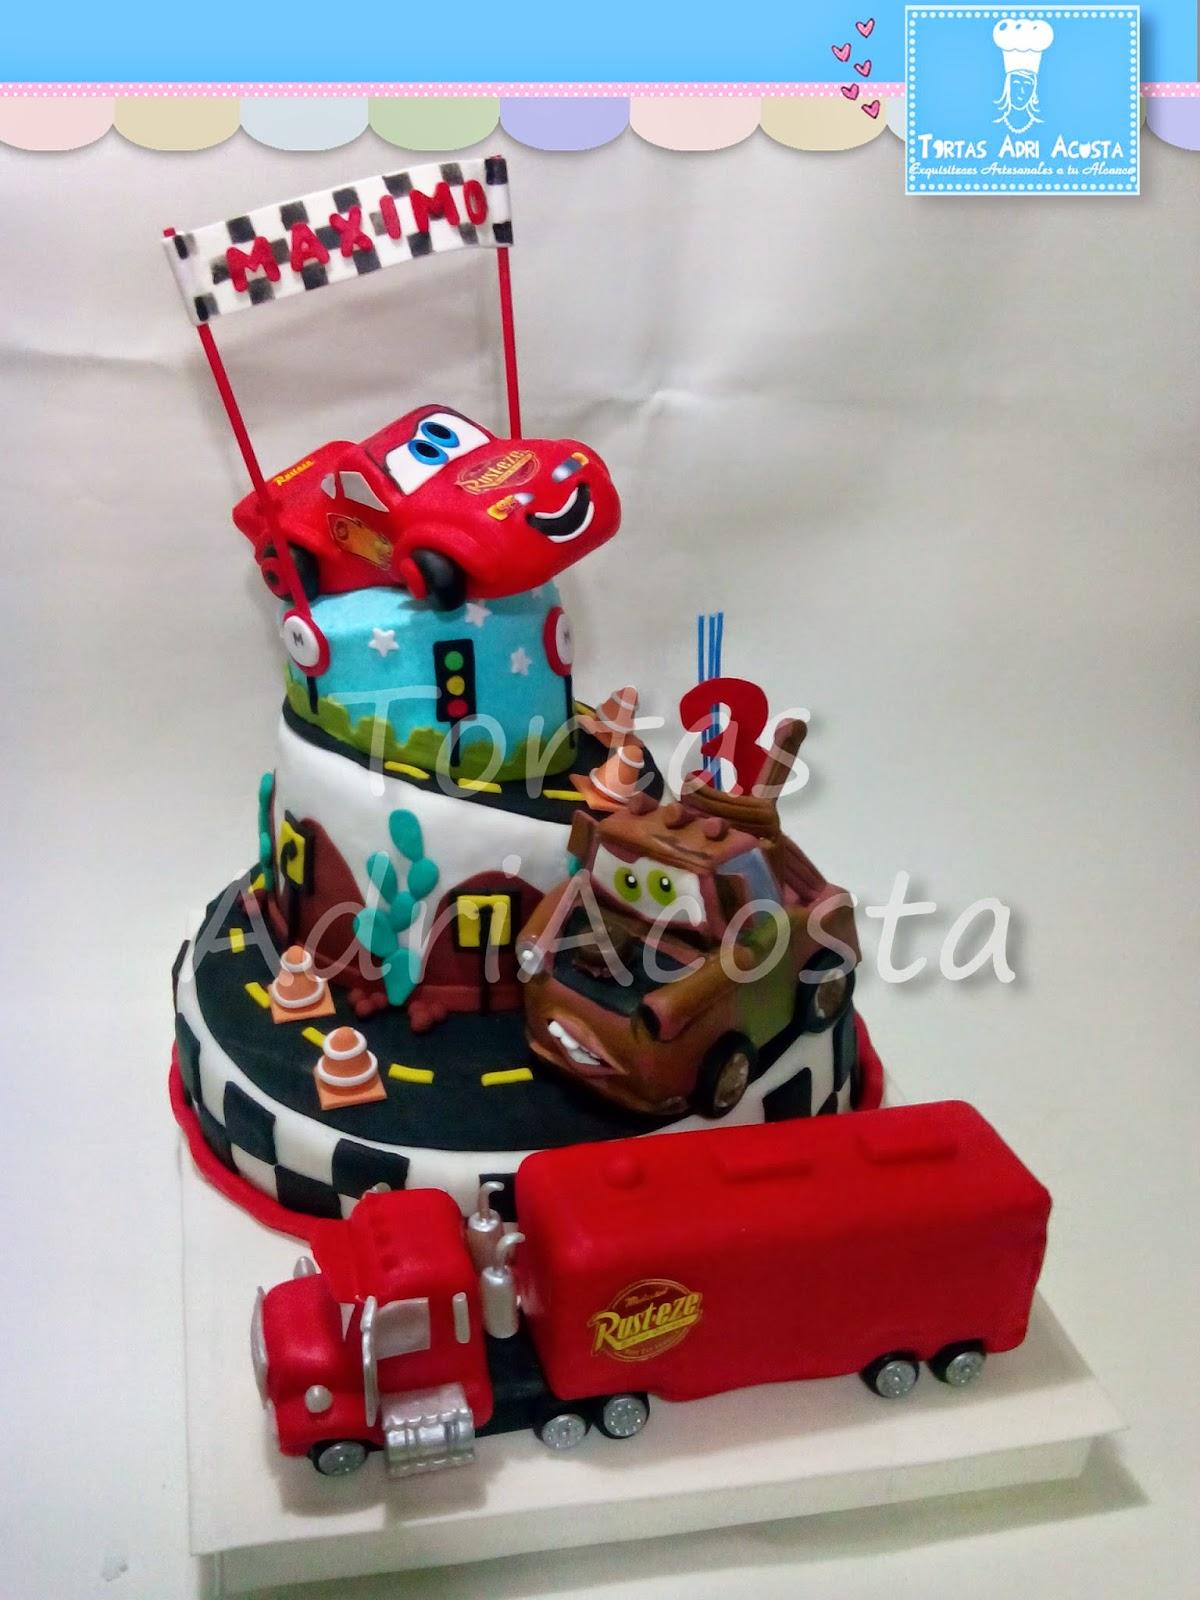 tortas adriana acosta infantiles tortas de cars holidays oo